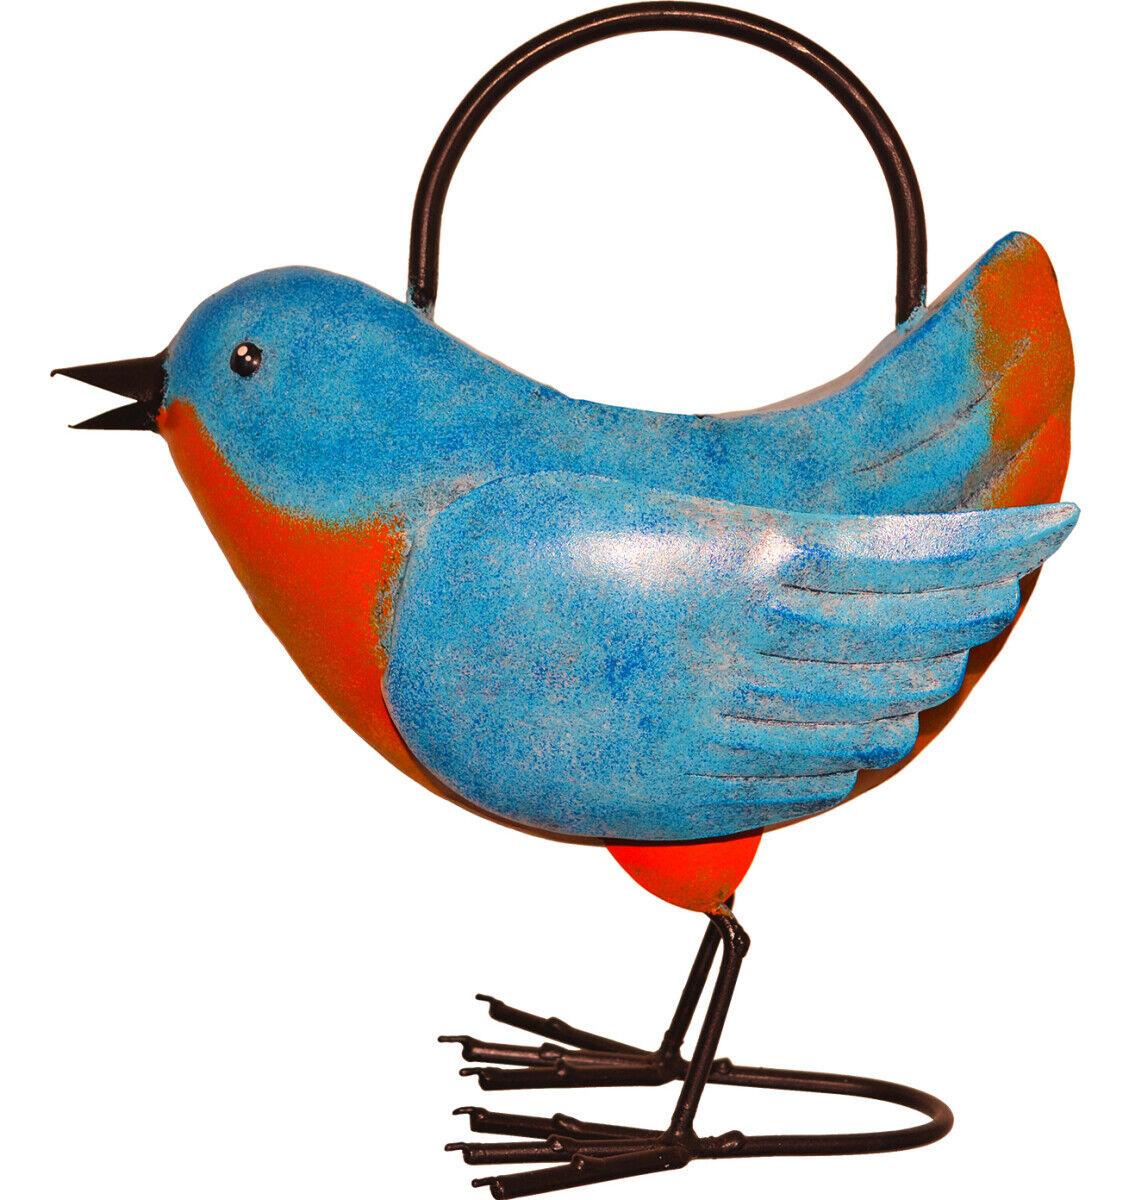 Timmy the Bluebird Handmade Metal Watering Can